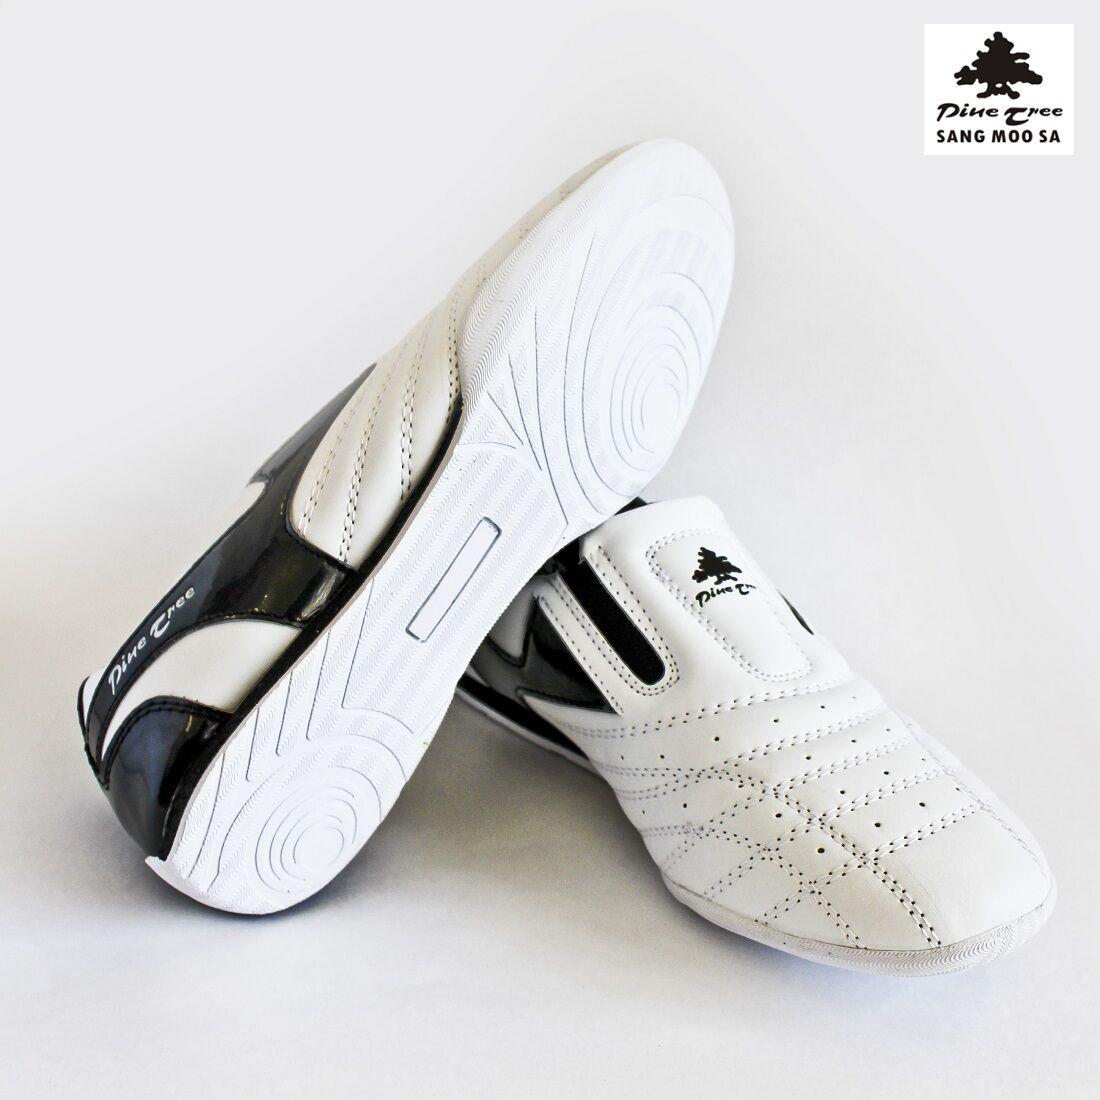 Details zu Taekwondo Schuhe Budo Kampfsportschuhe Martial Arts Schuh Master Class PineTree